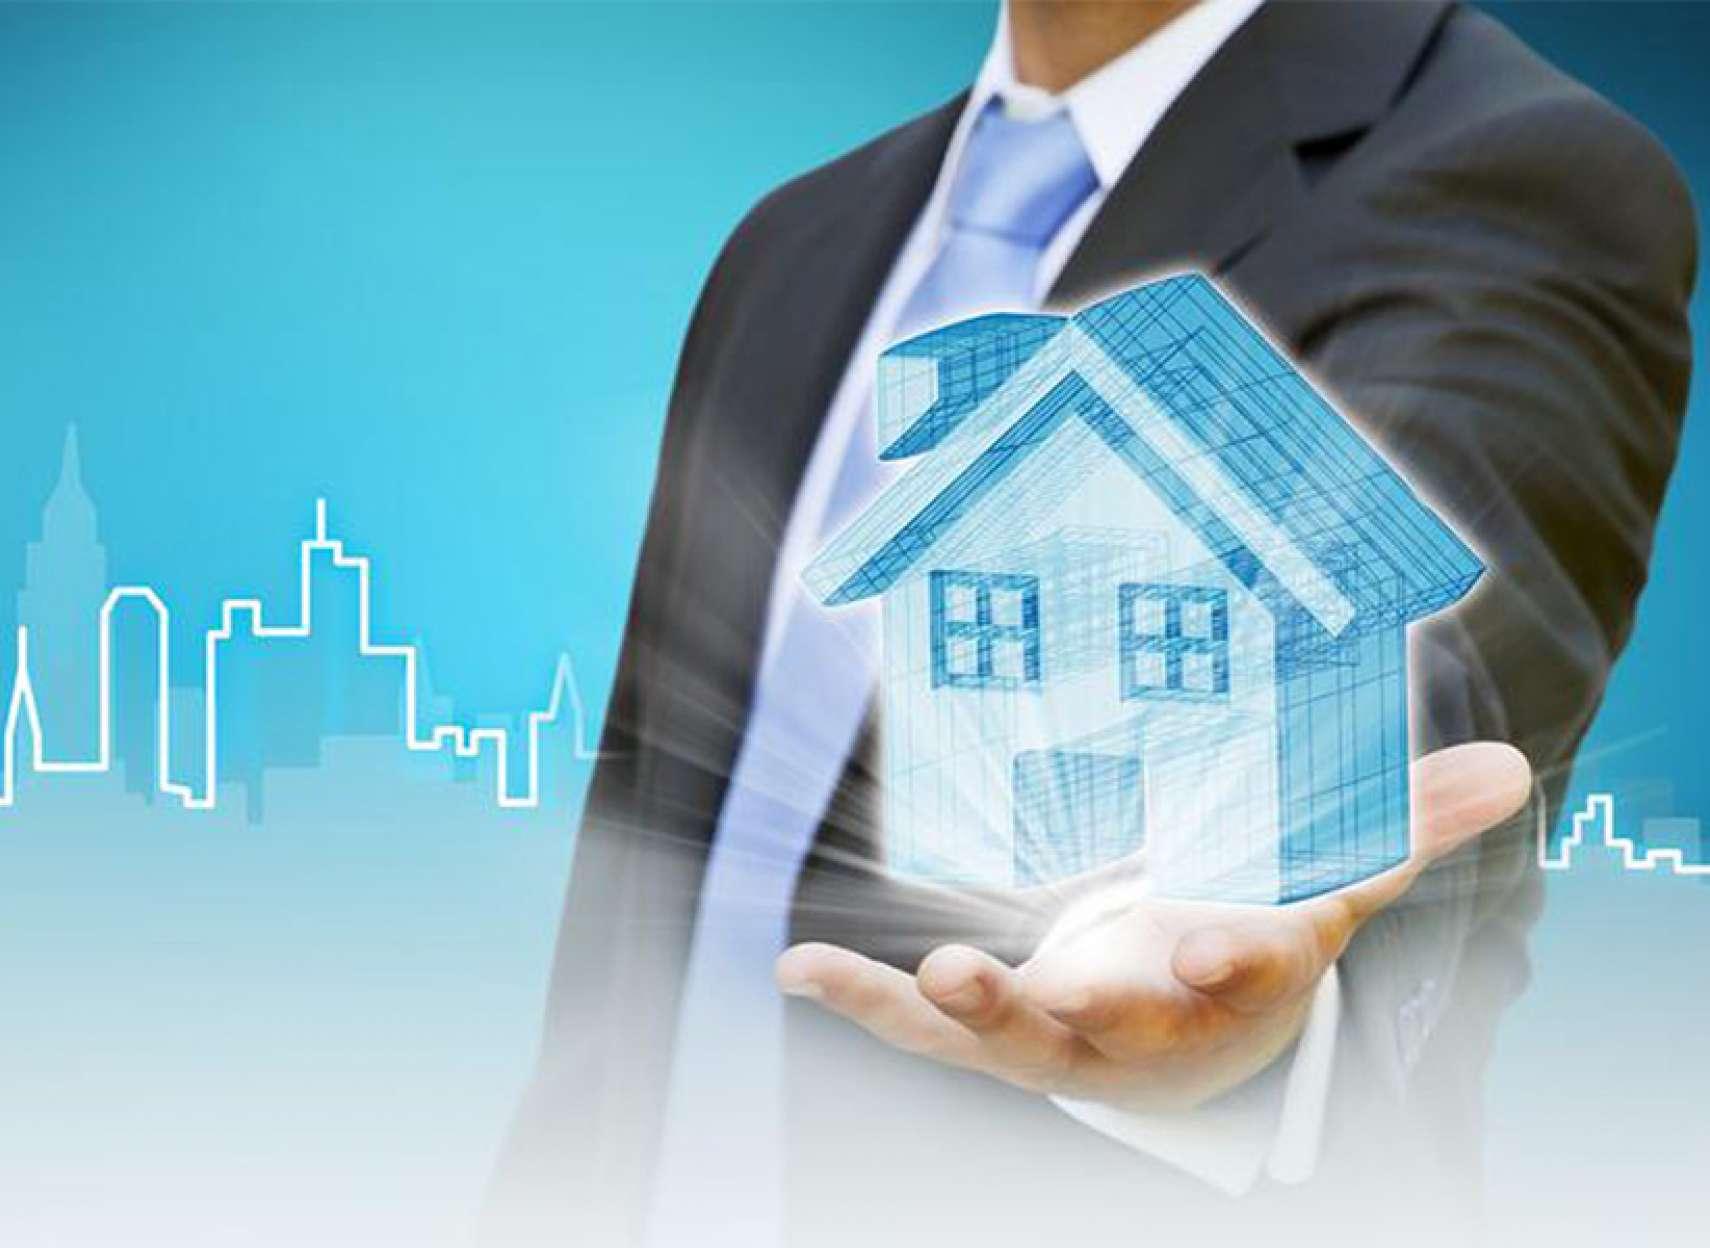 real-estate-anvari-miparam-hastam